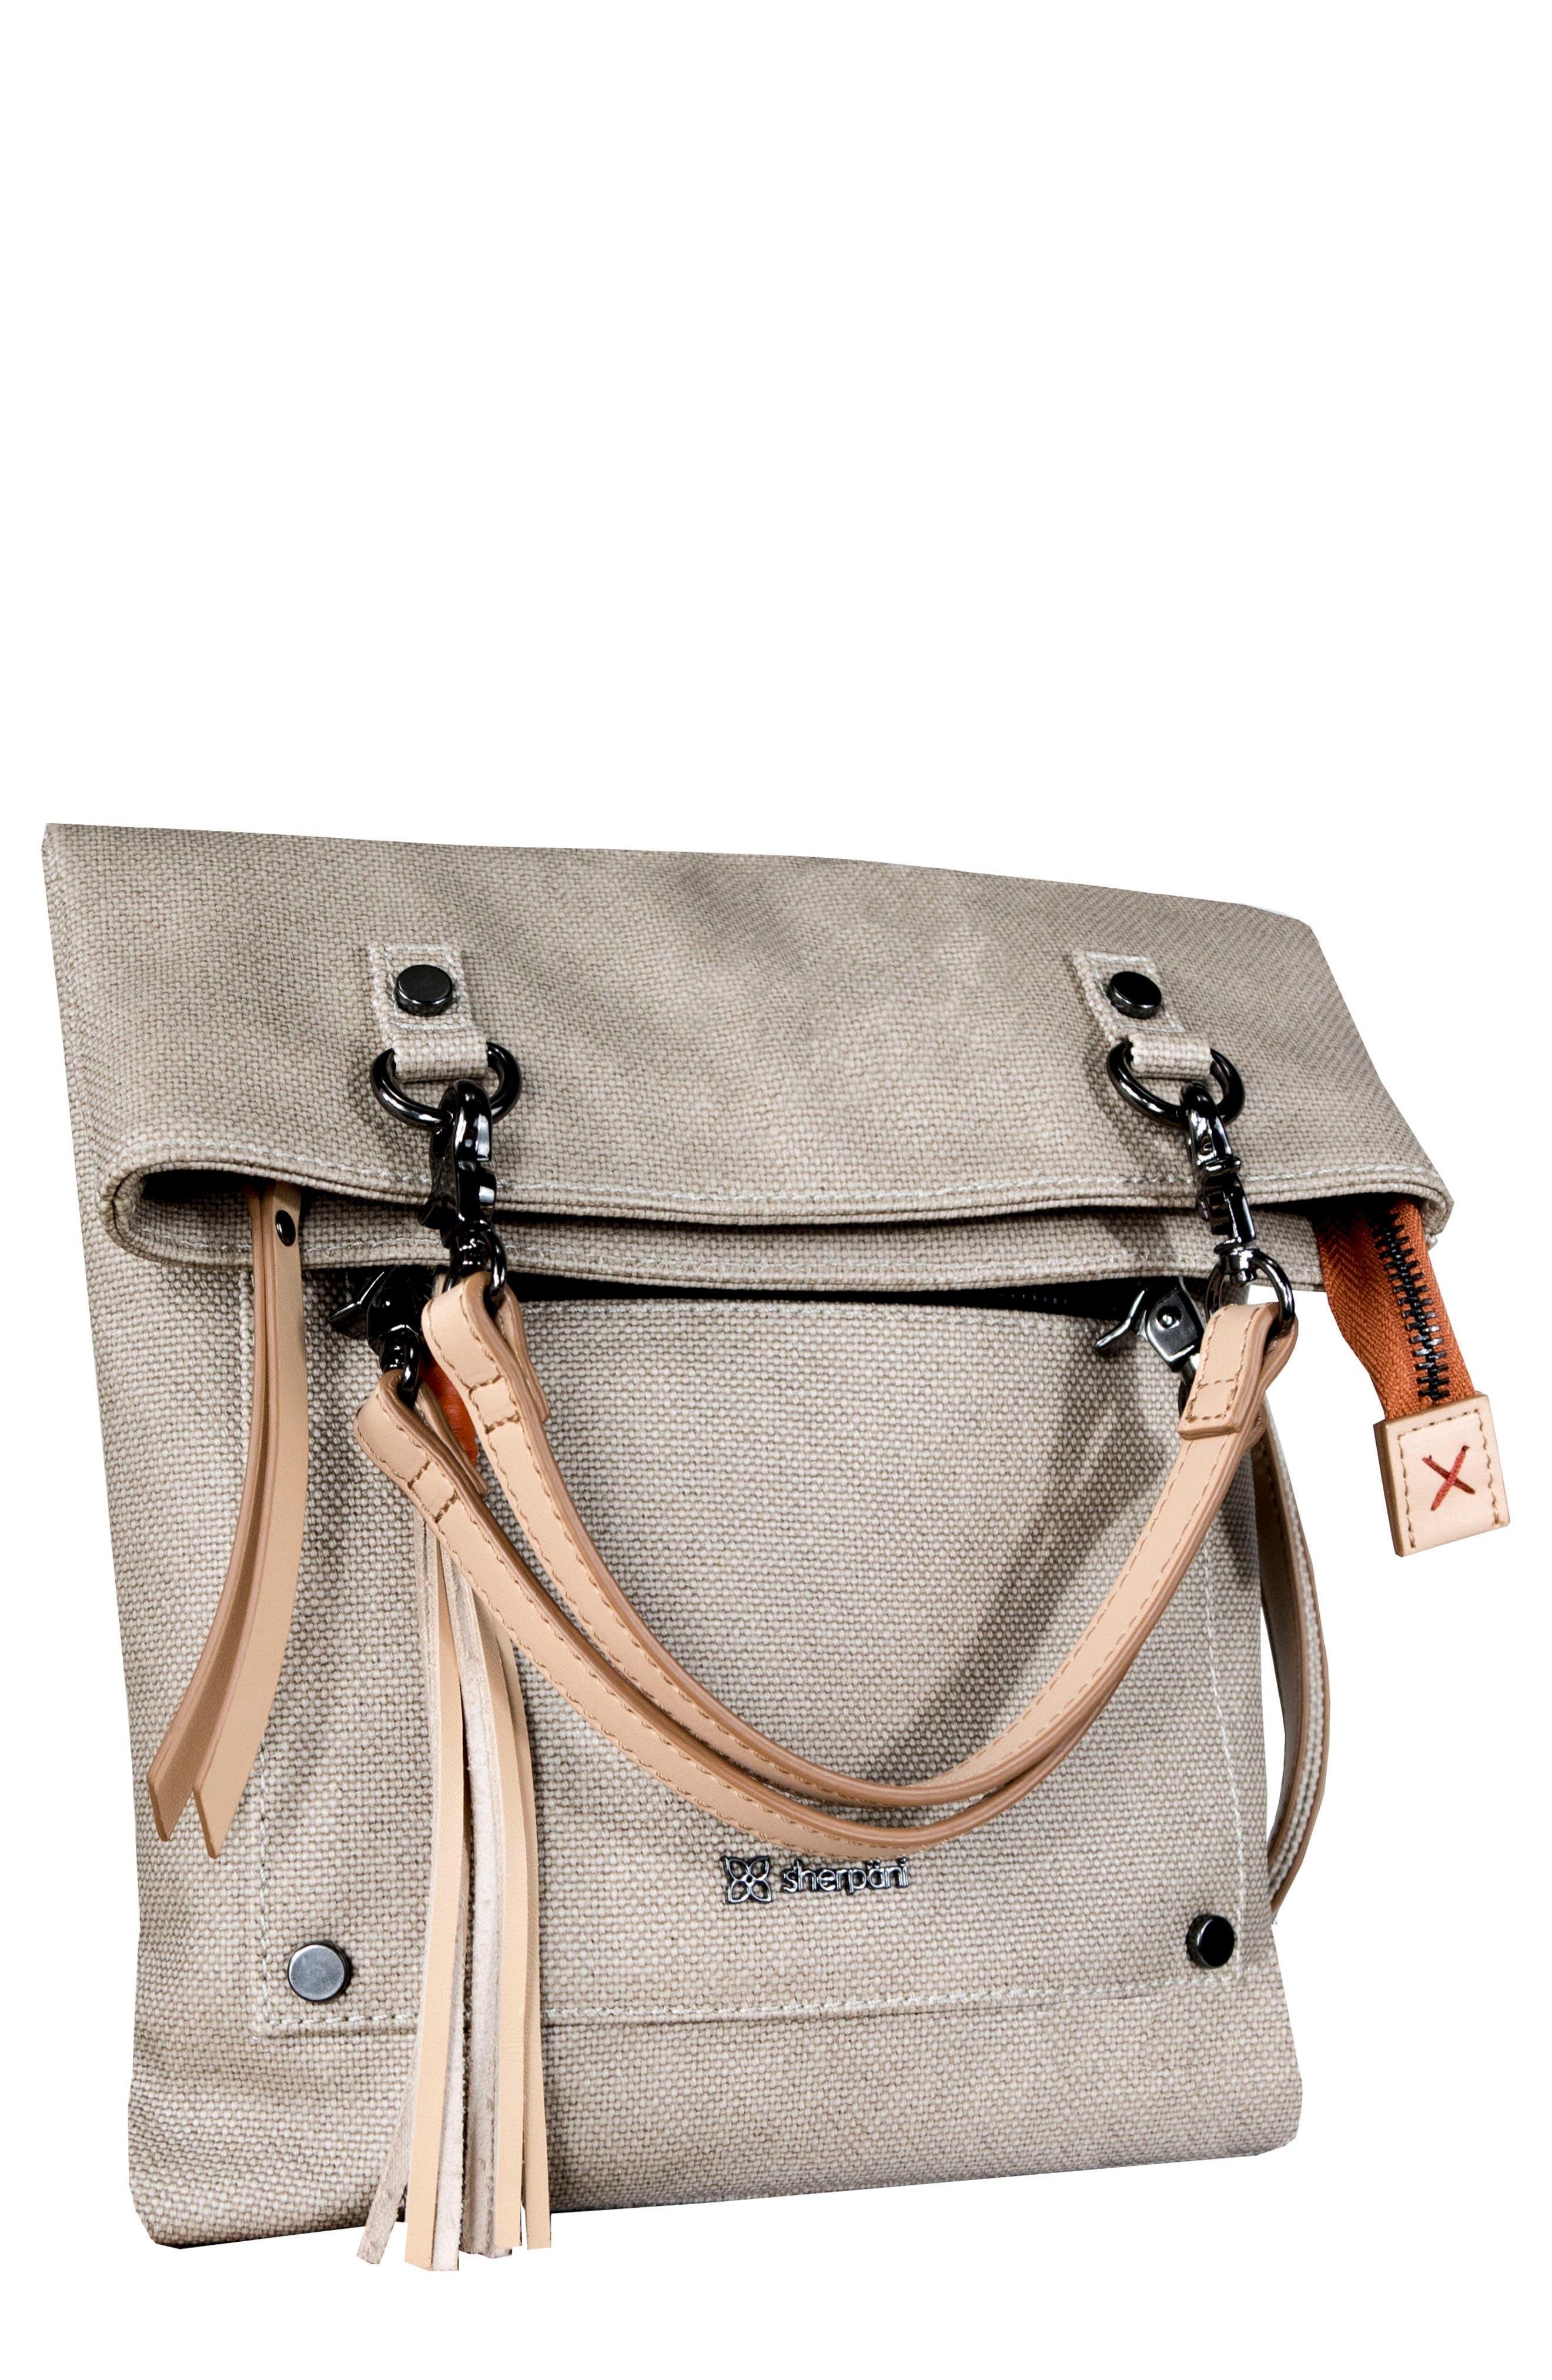 SHERPANI Rebel Coated Canvas Crossbody Bag, Main, color, NATURAL